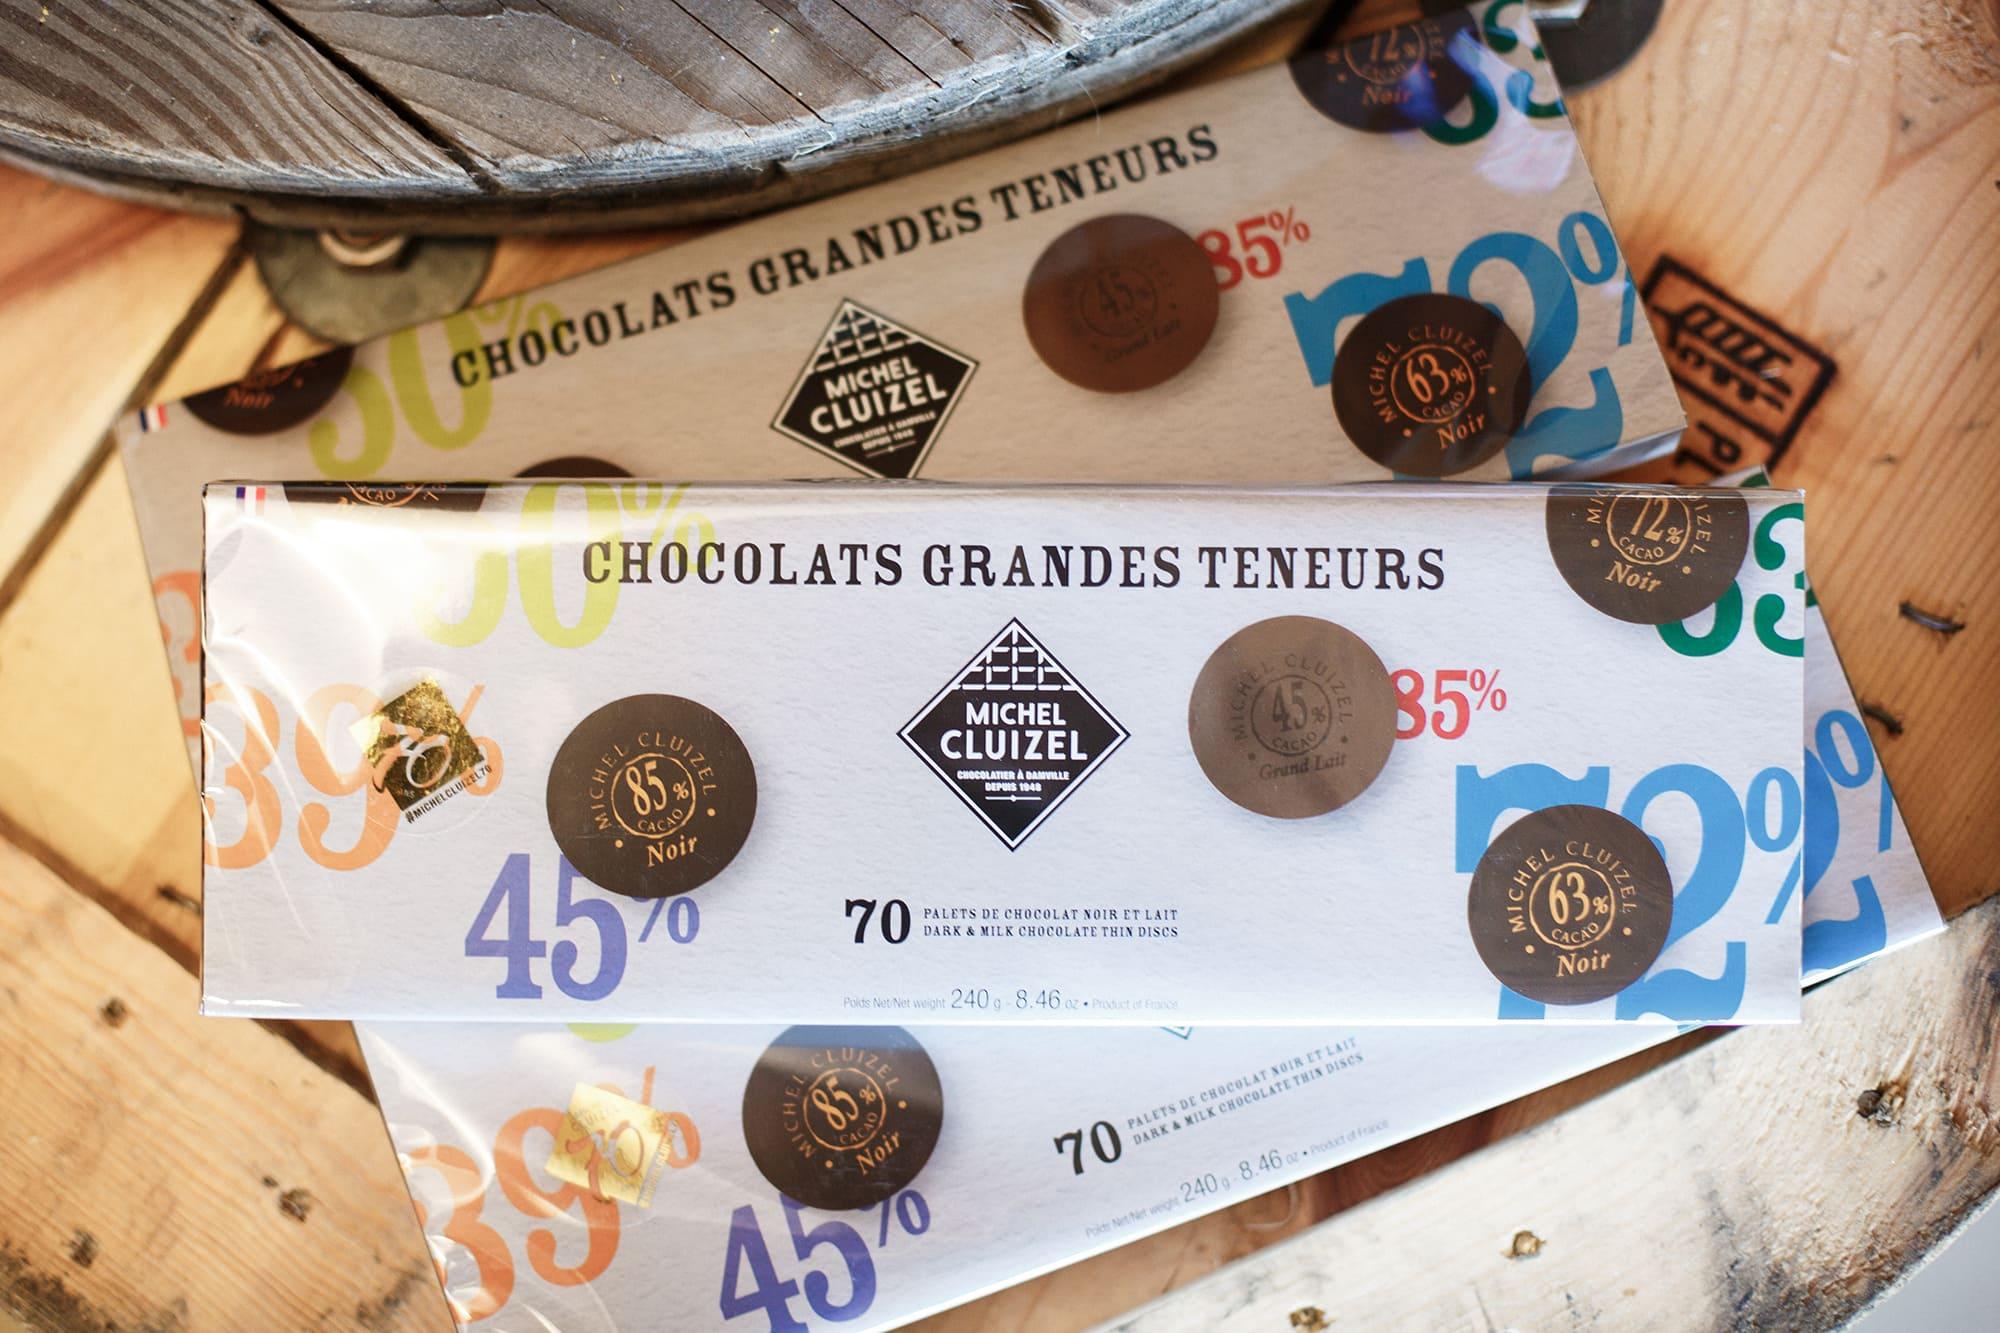 chocolat grandes teneurs michel cluizel